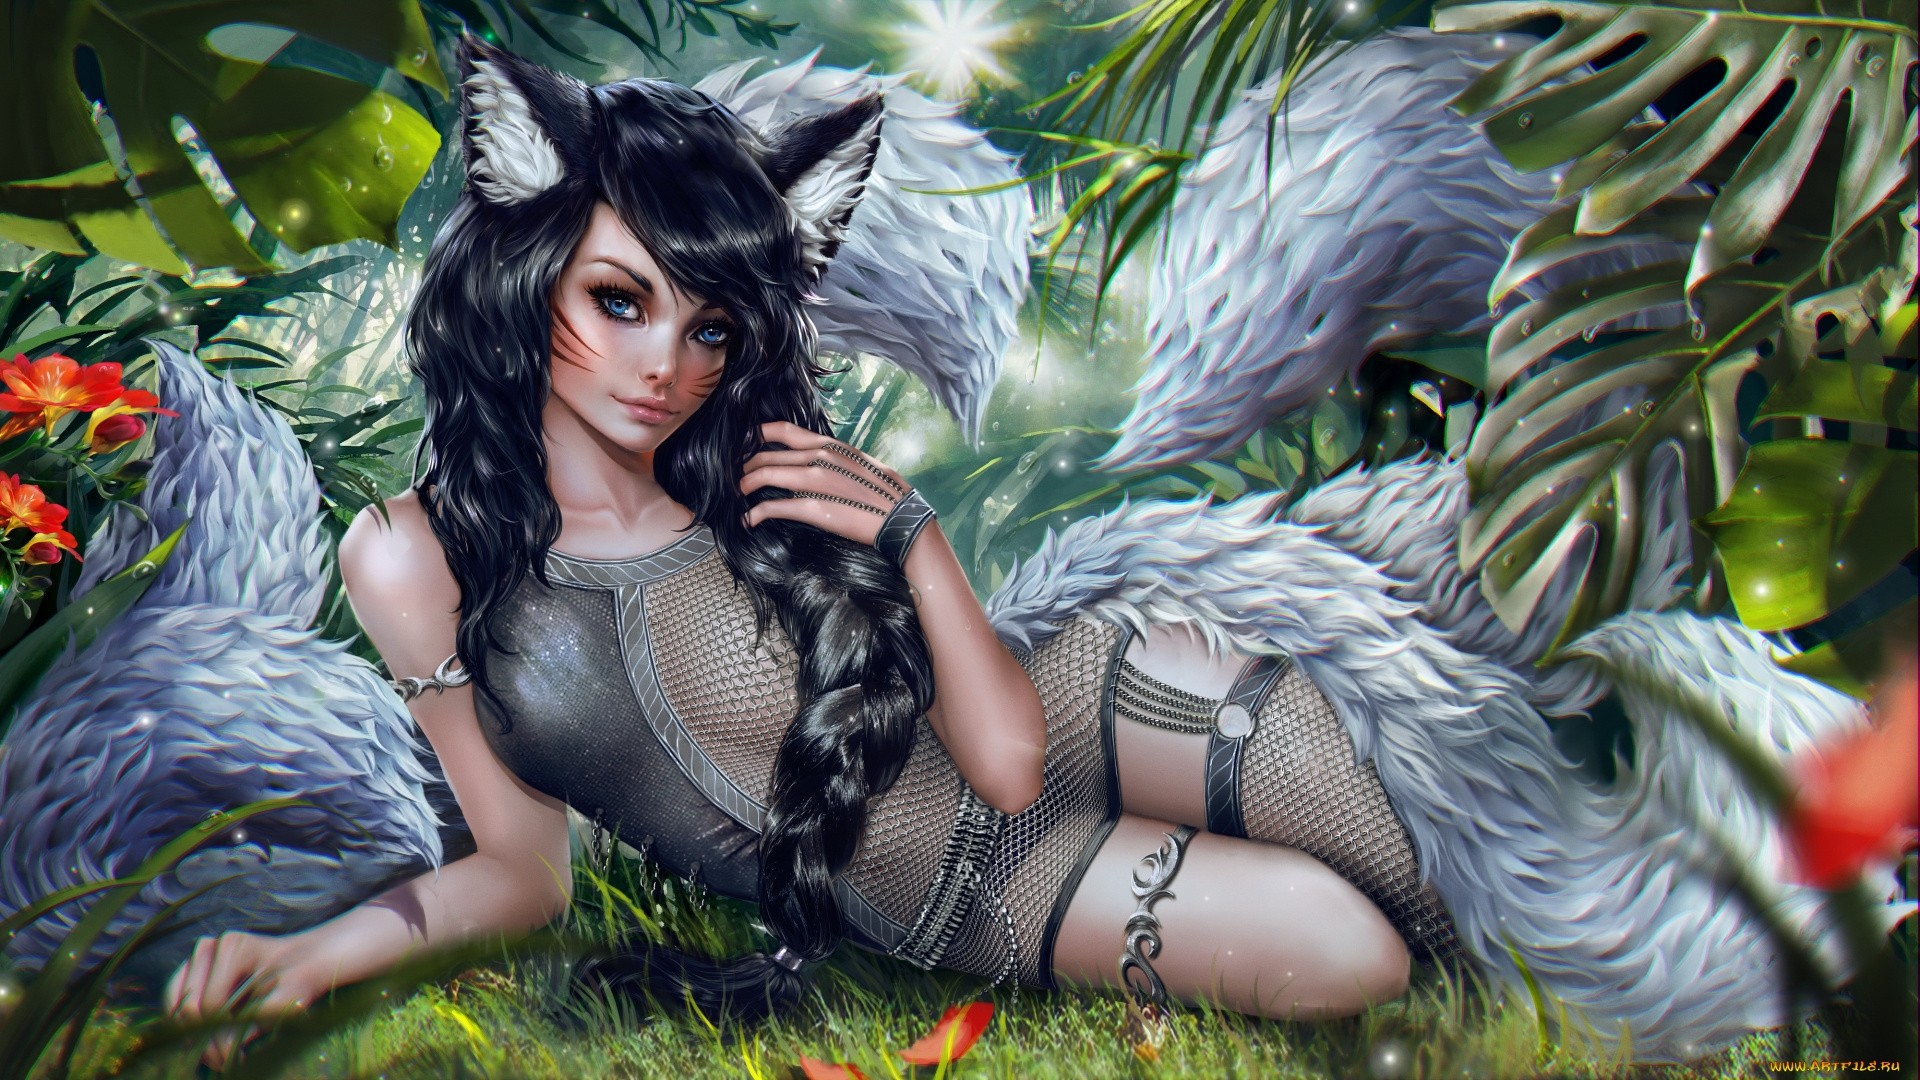 Fantasy Girl Image